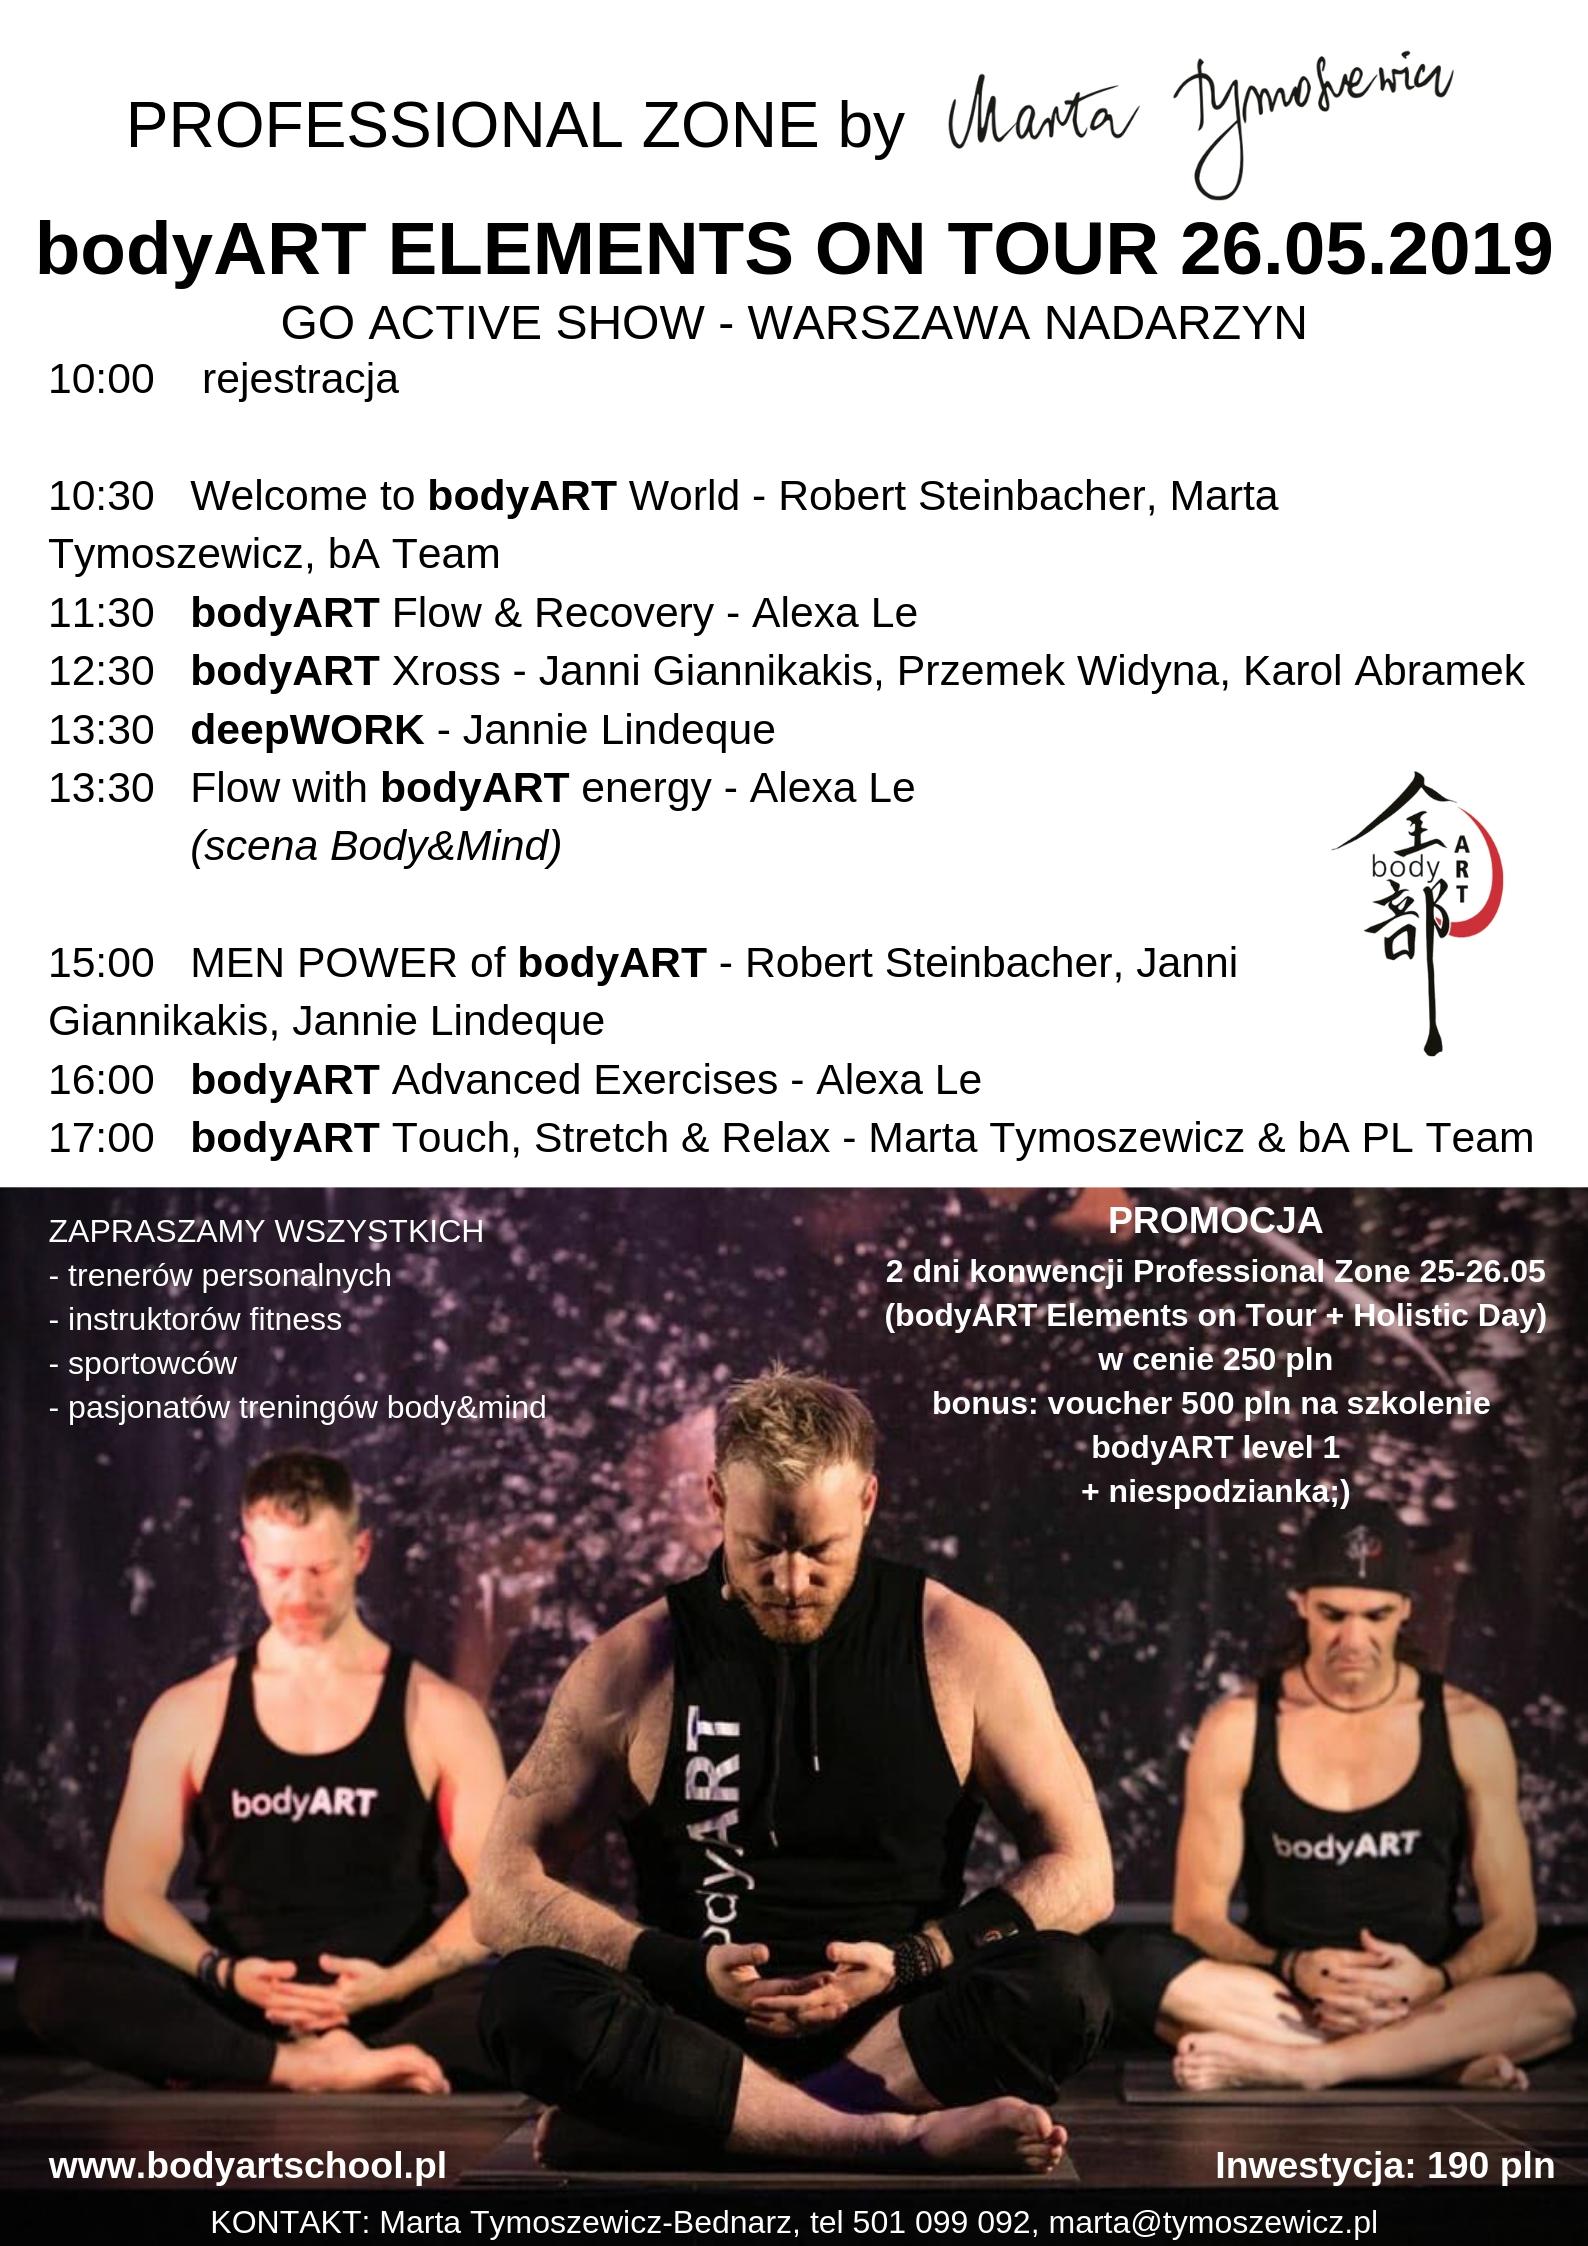 bodyART Elements on Tour 26.05.2019